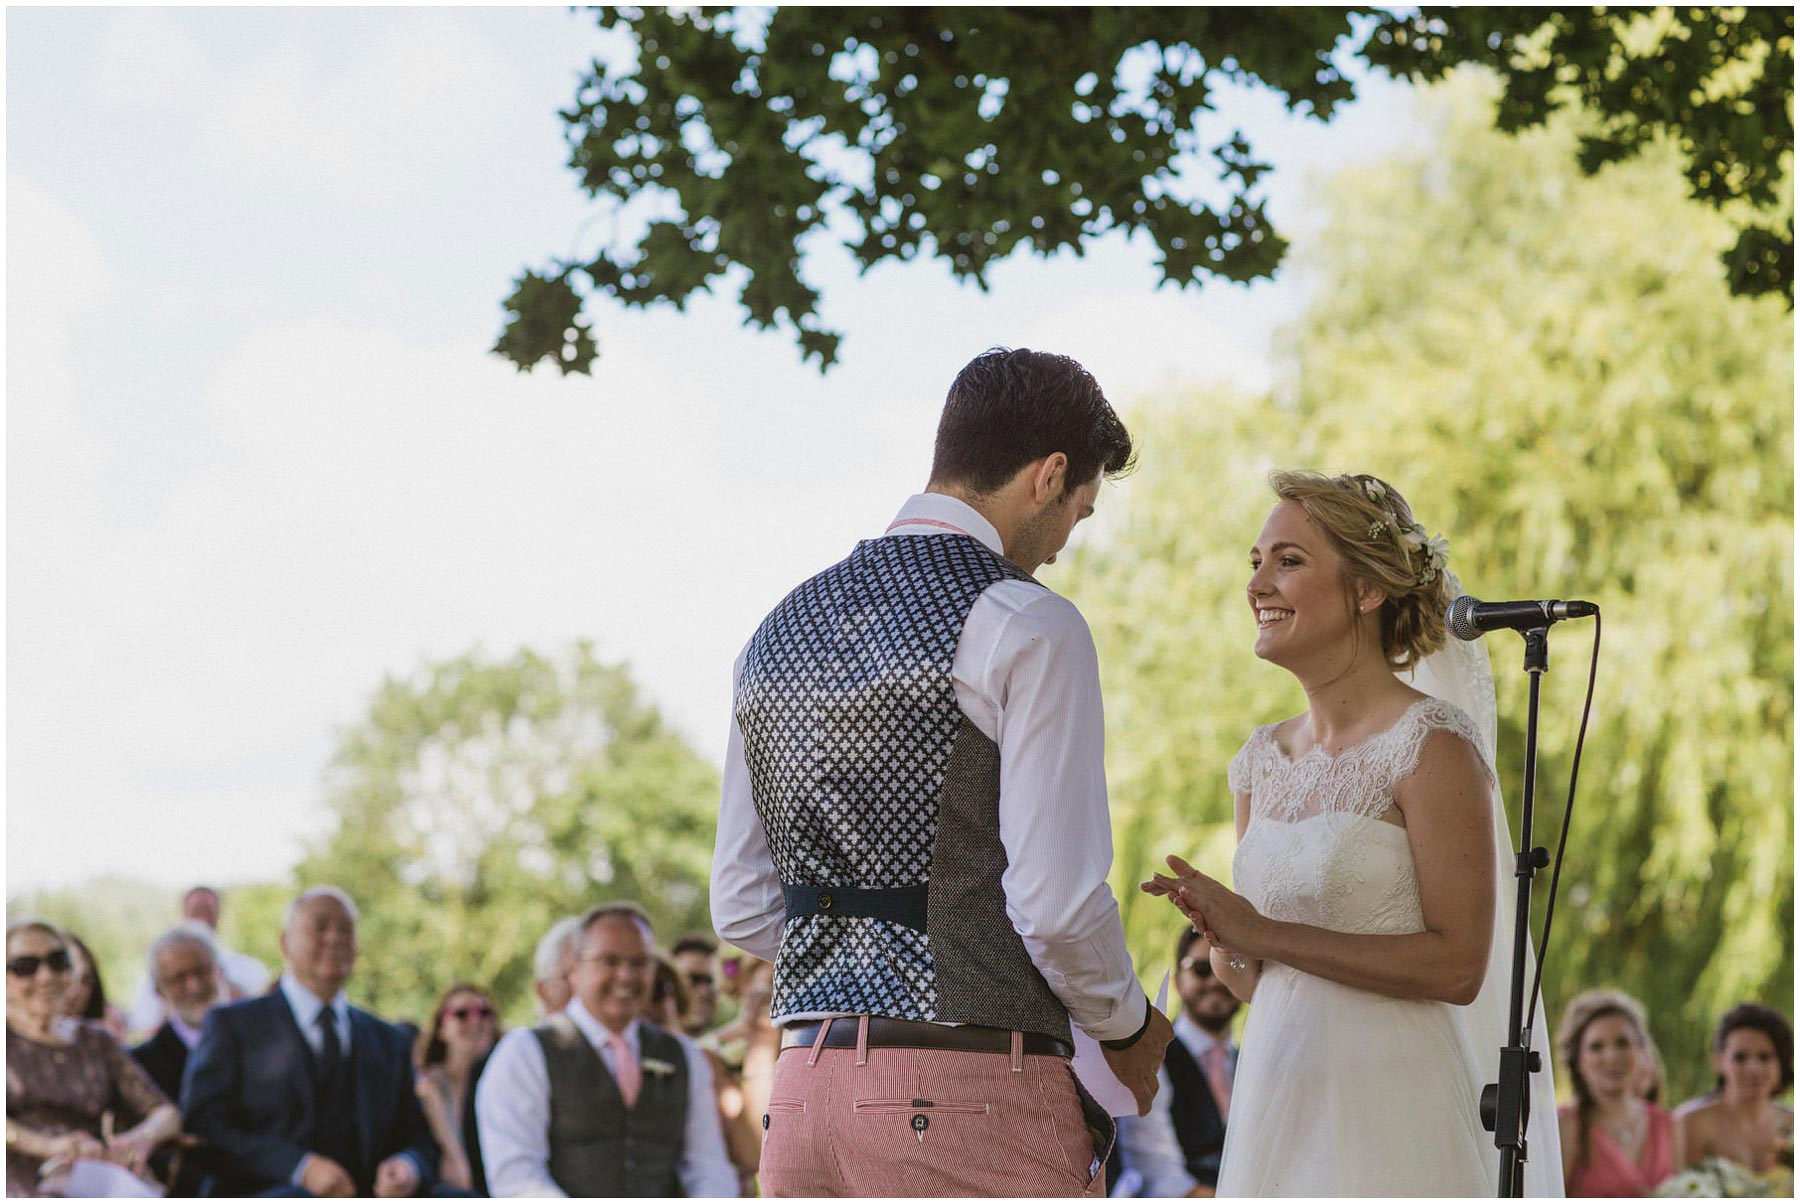 Kent-Festival-Tipi-wedding-photography_0066